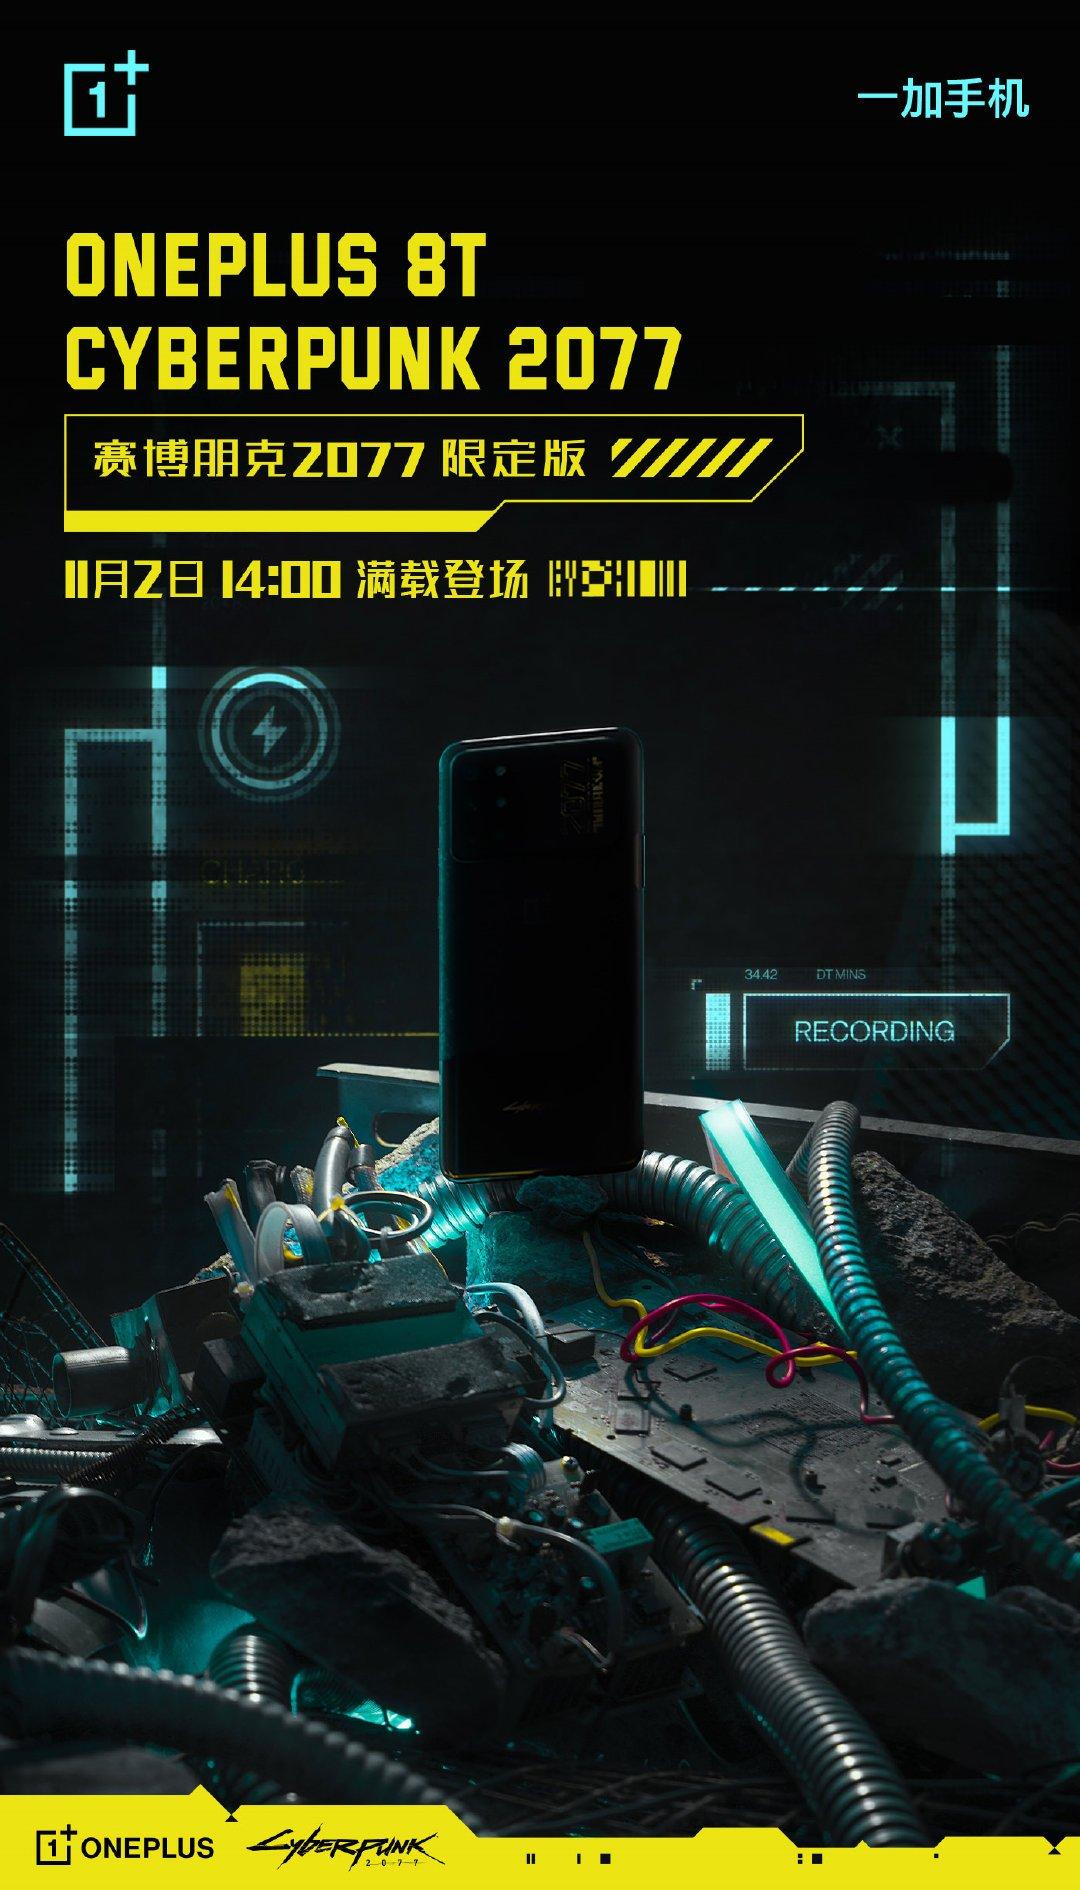 OnePlus 8T赛博朋克2077限定版将于11月2日正式登场